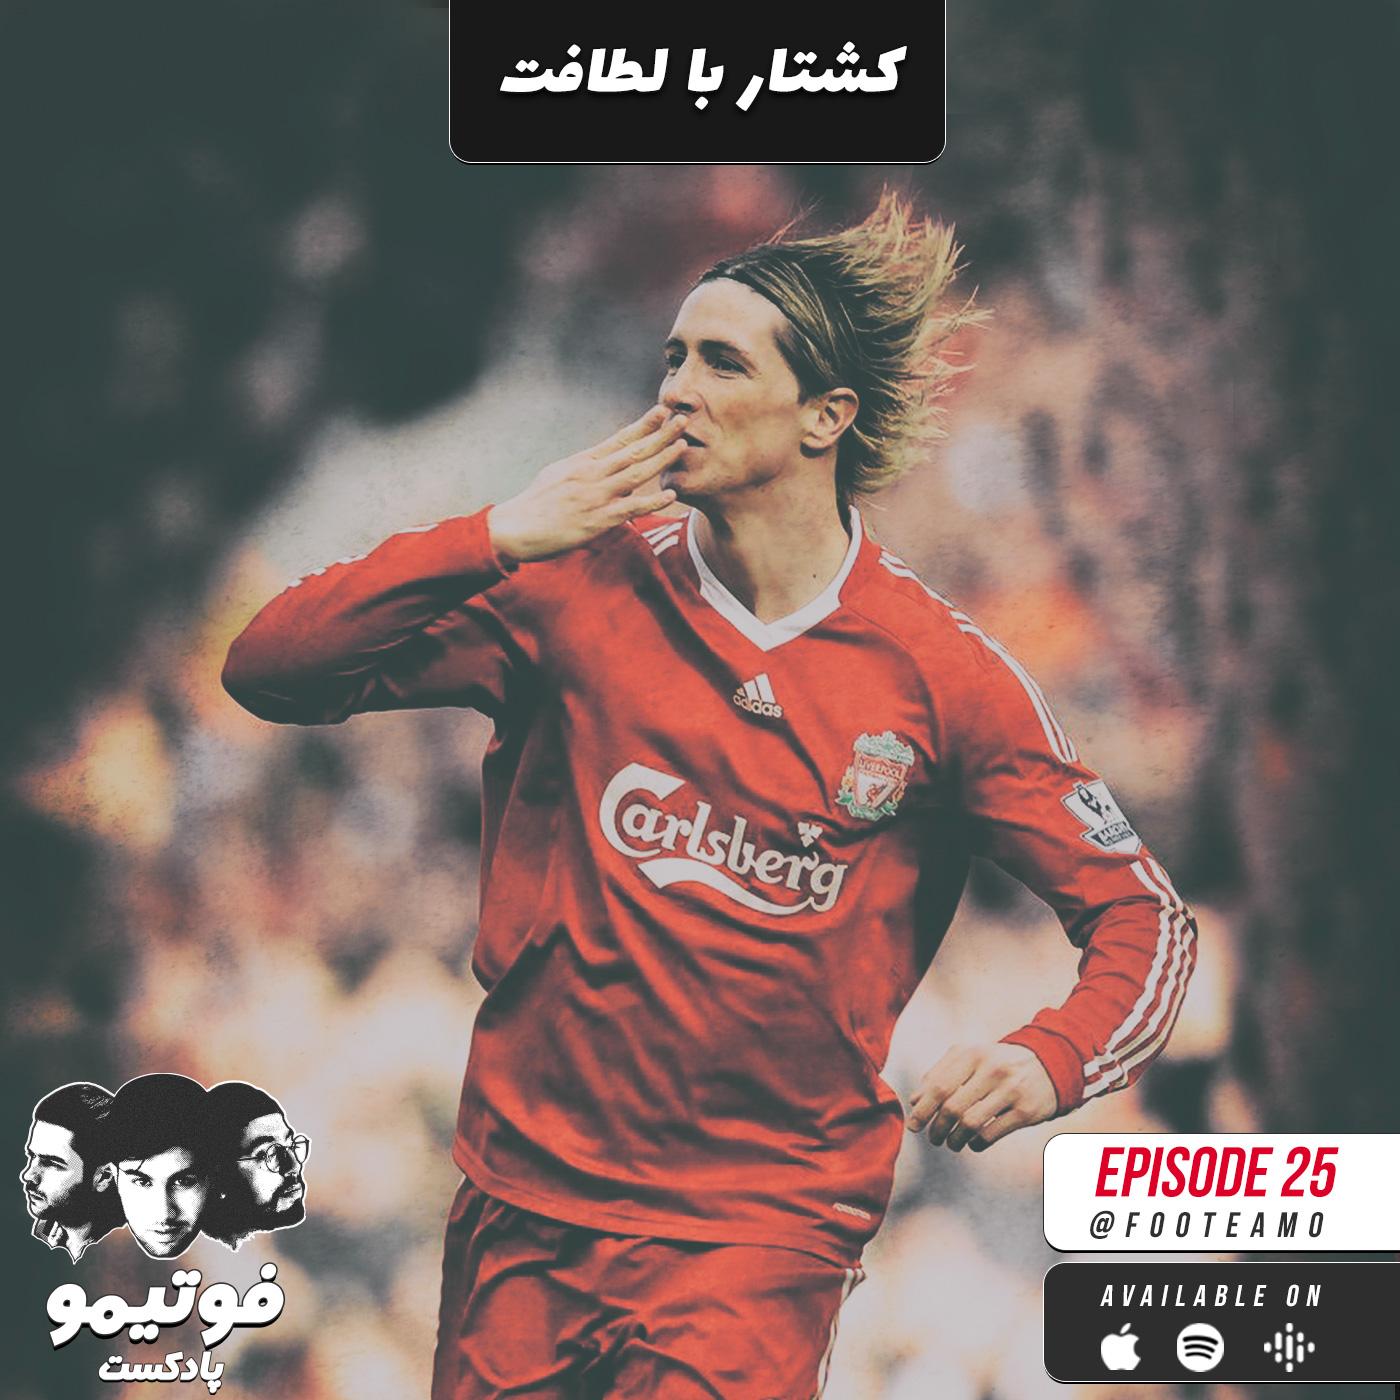 Poster Episode25 پادکست فوتبالی فوتیمو